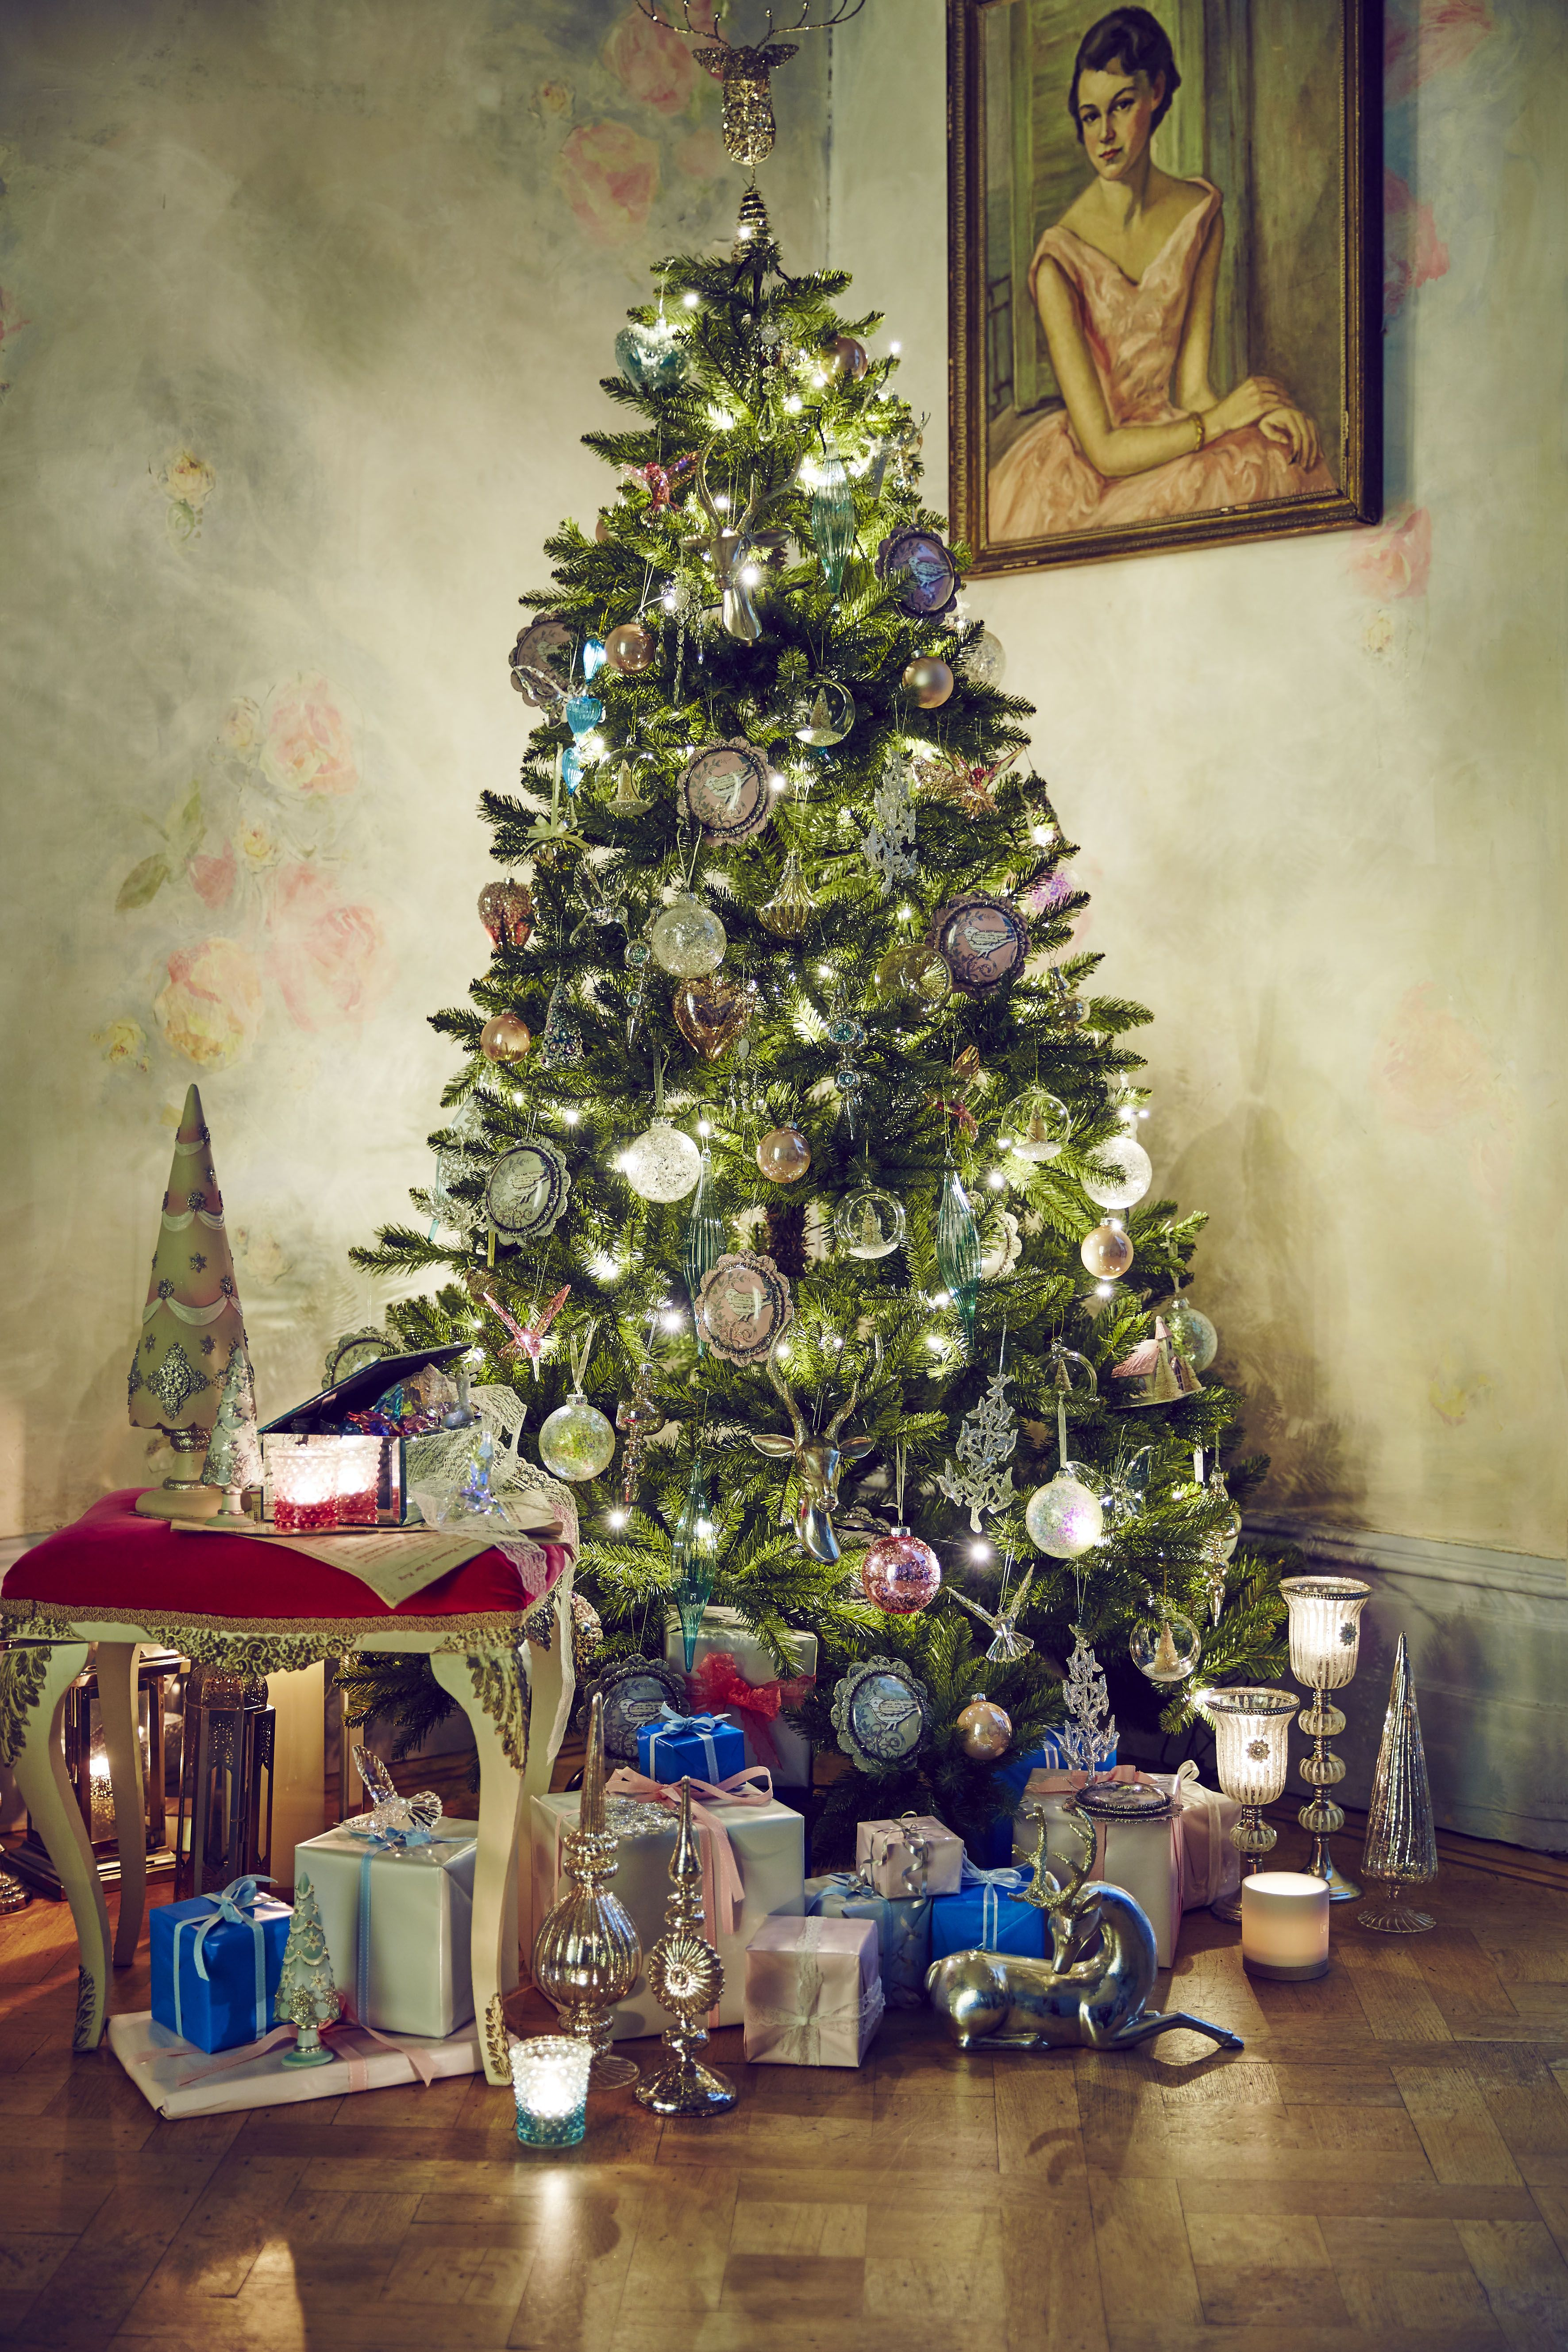 Christmas Decorations Wyevale Garden Centre